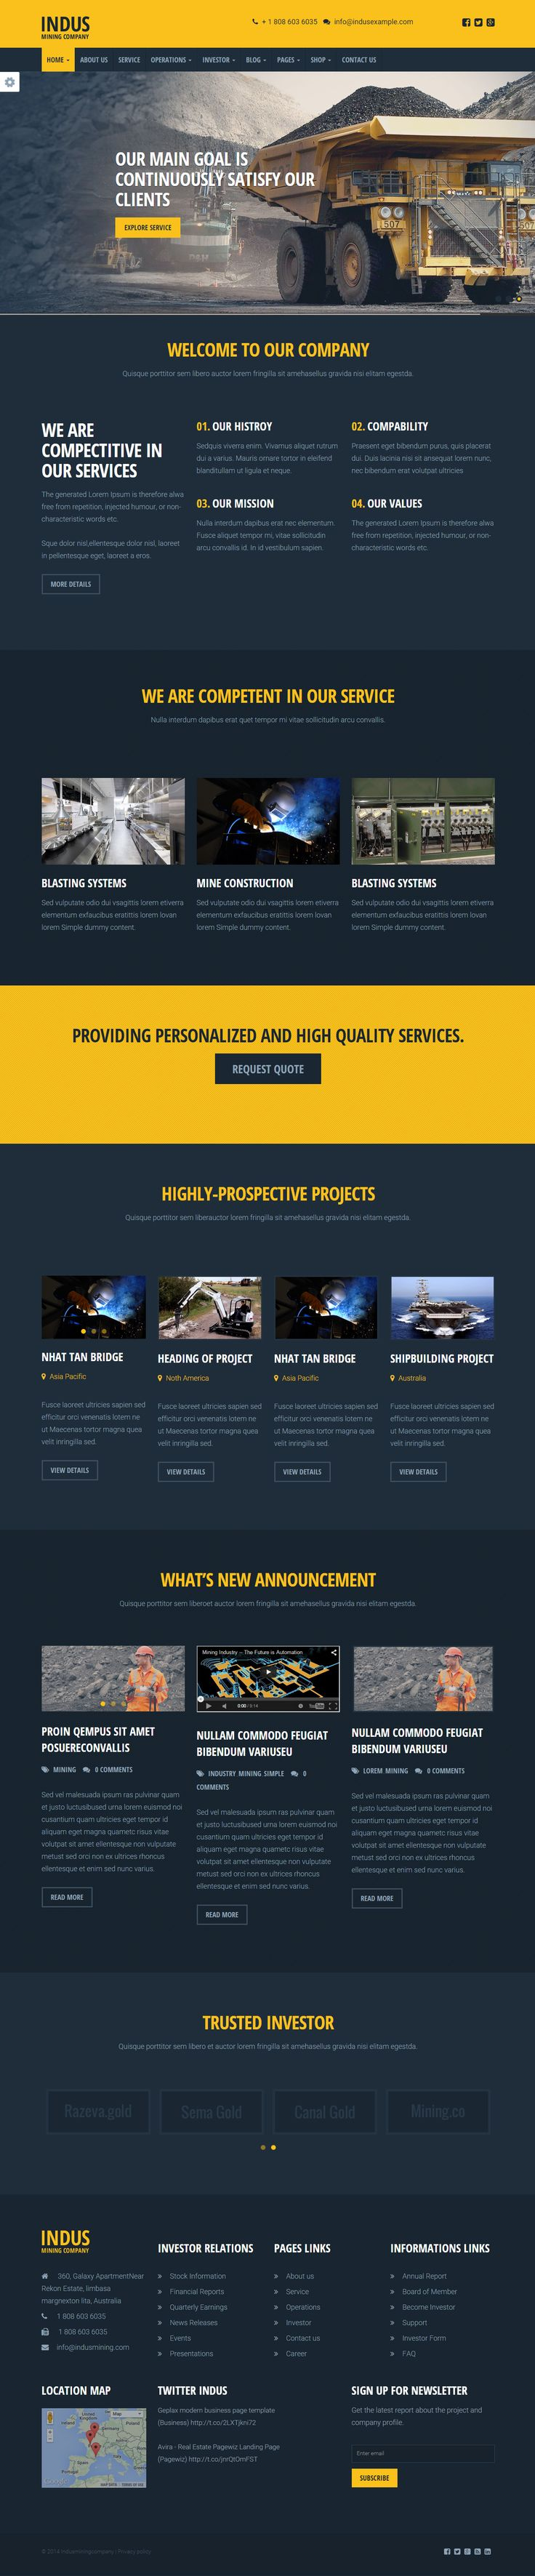 best website templates images on pinterest website designs